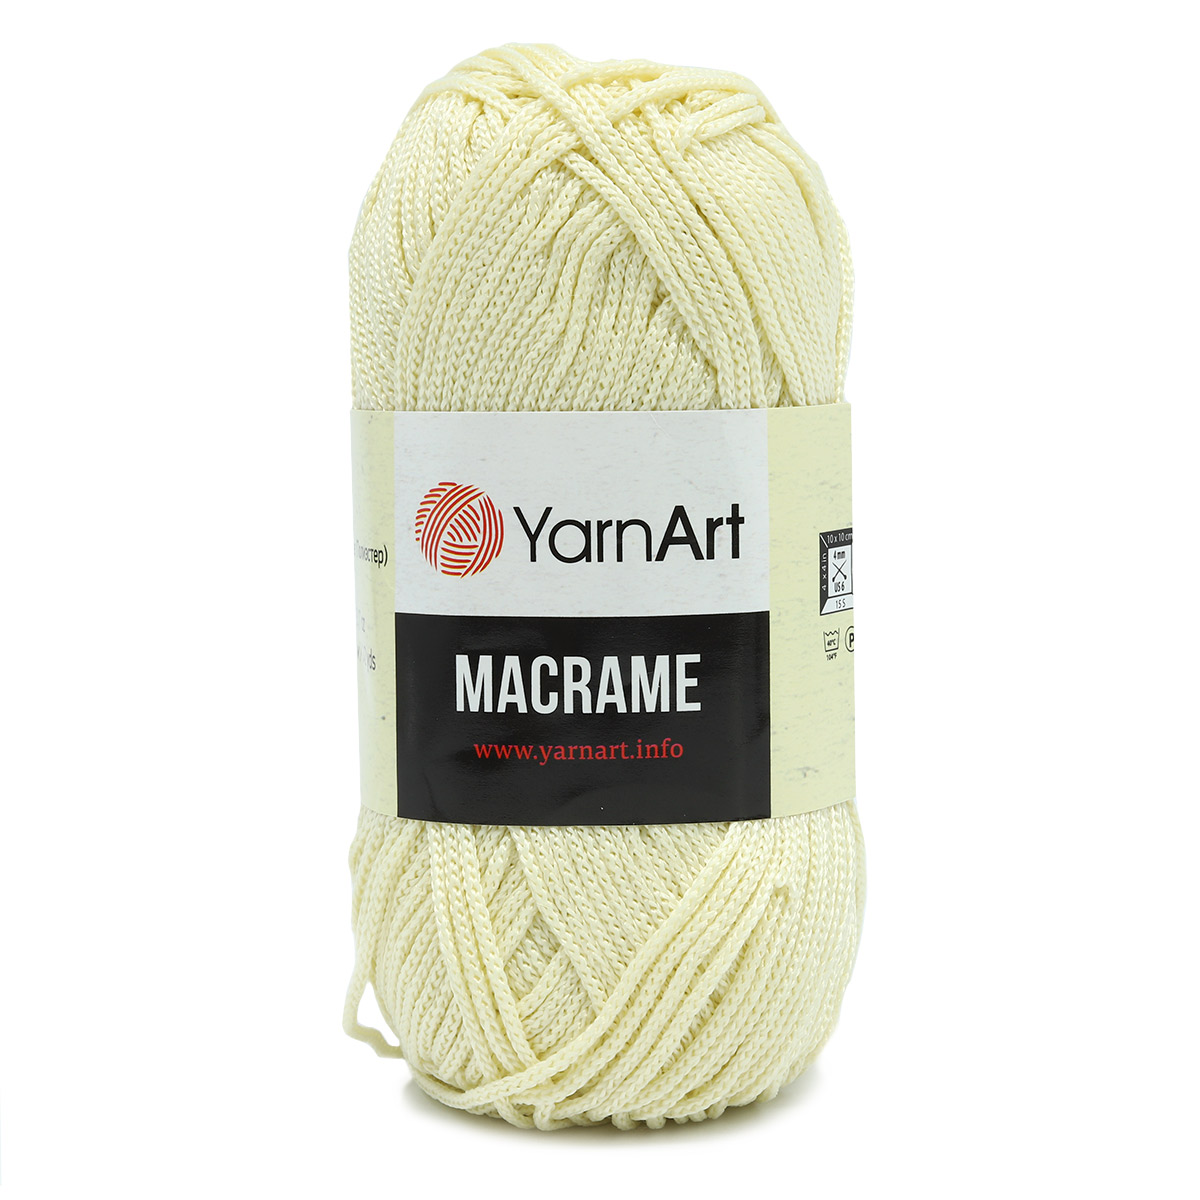 Пряжа YarnArt 'Macrame' 90гр 130м (100% полиэстер)